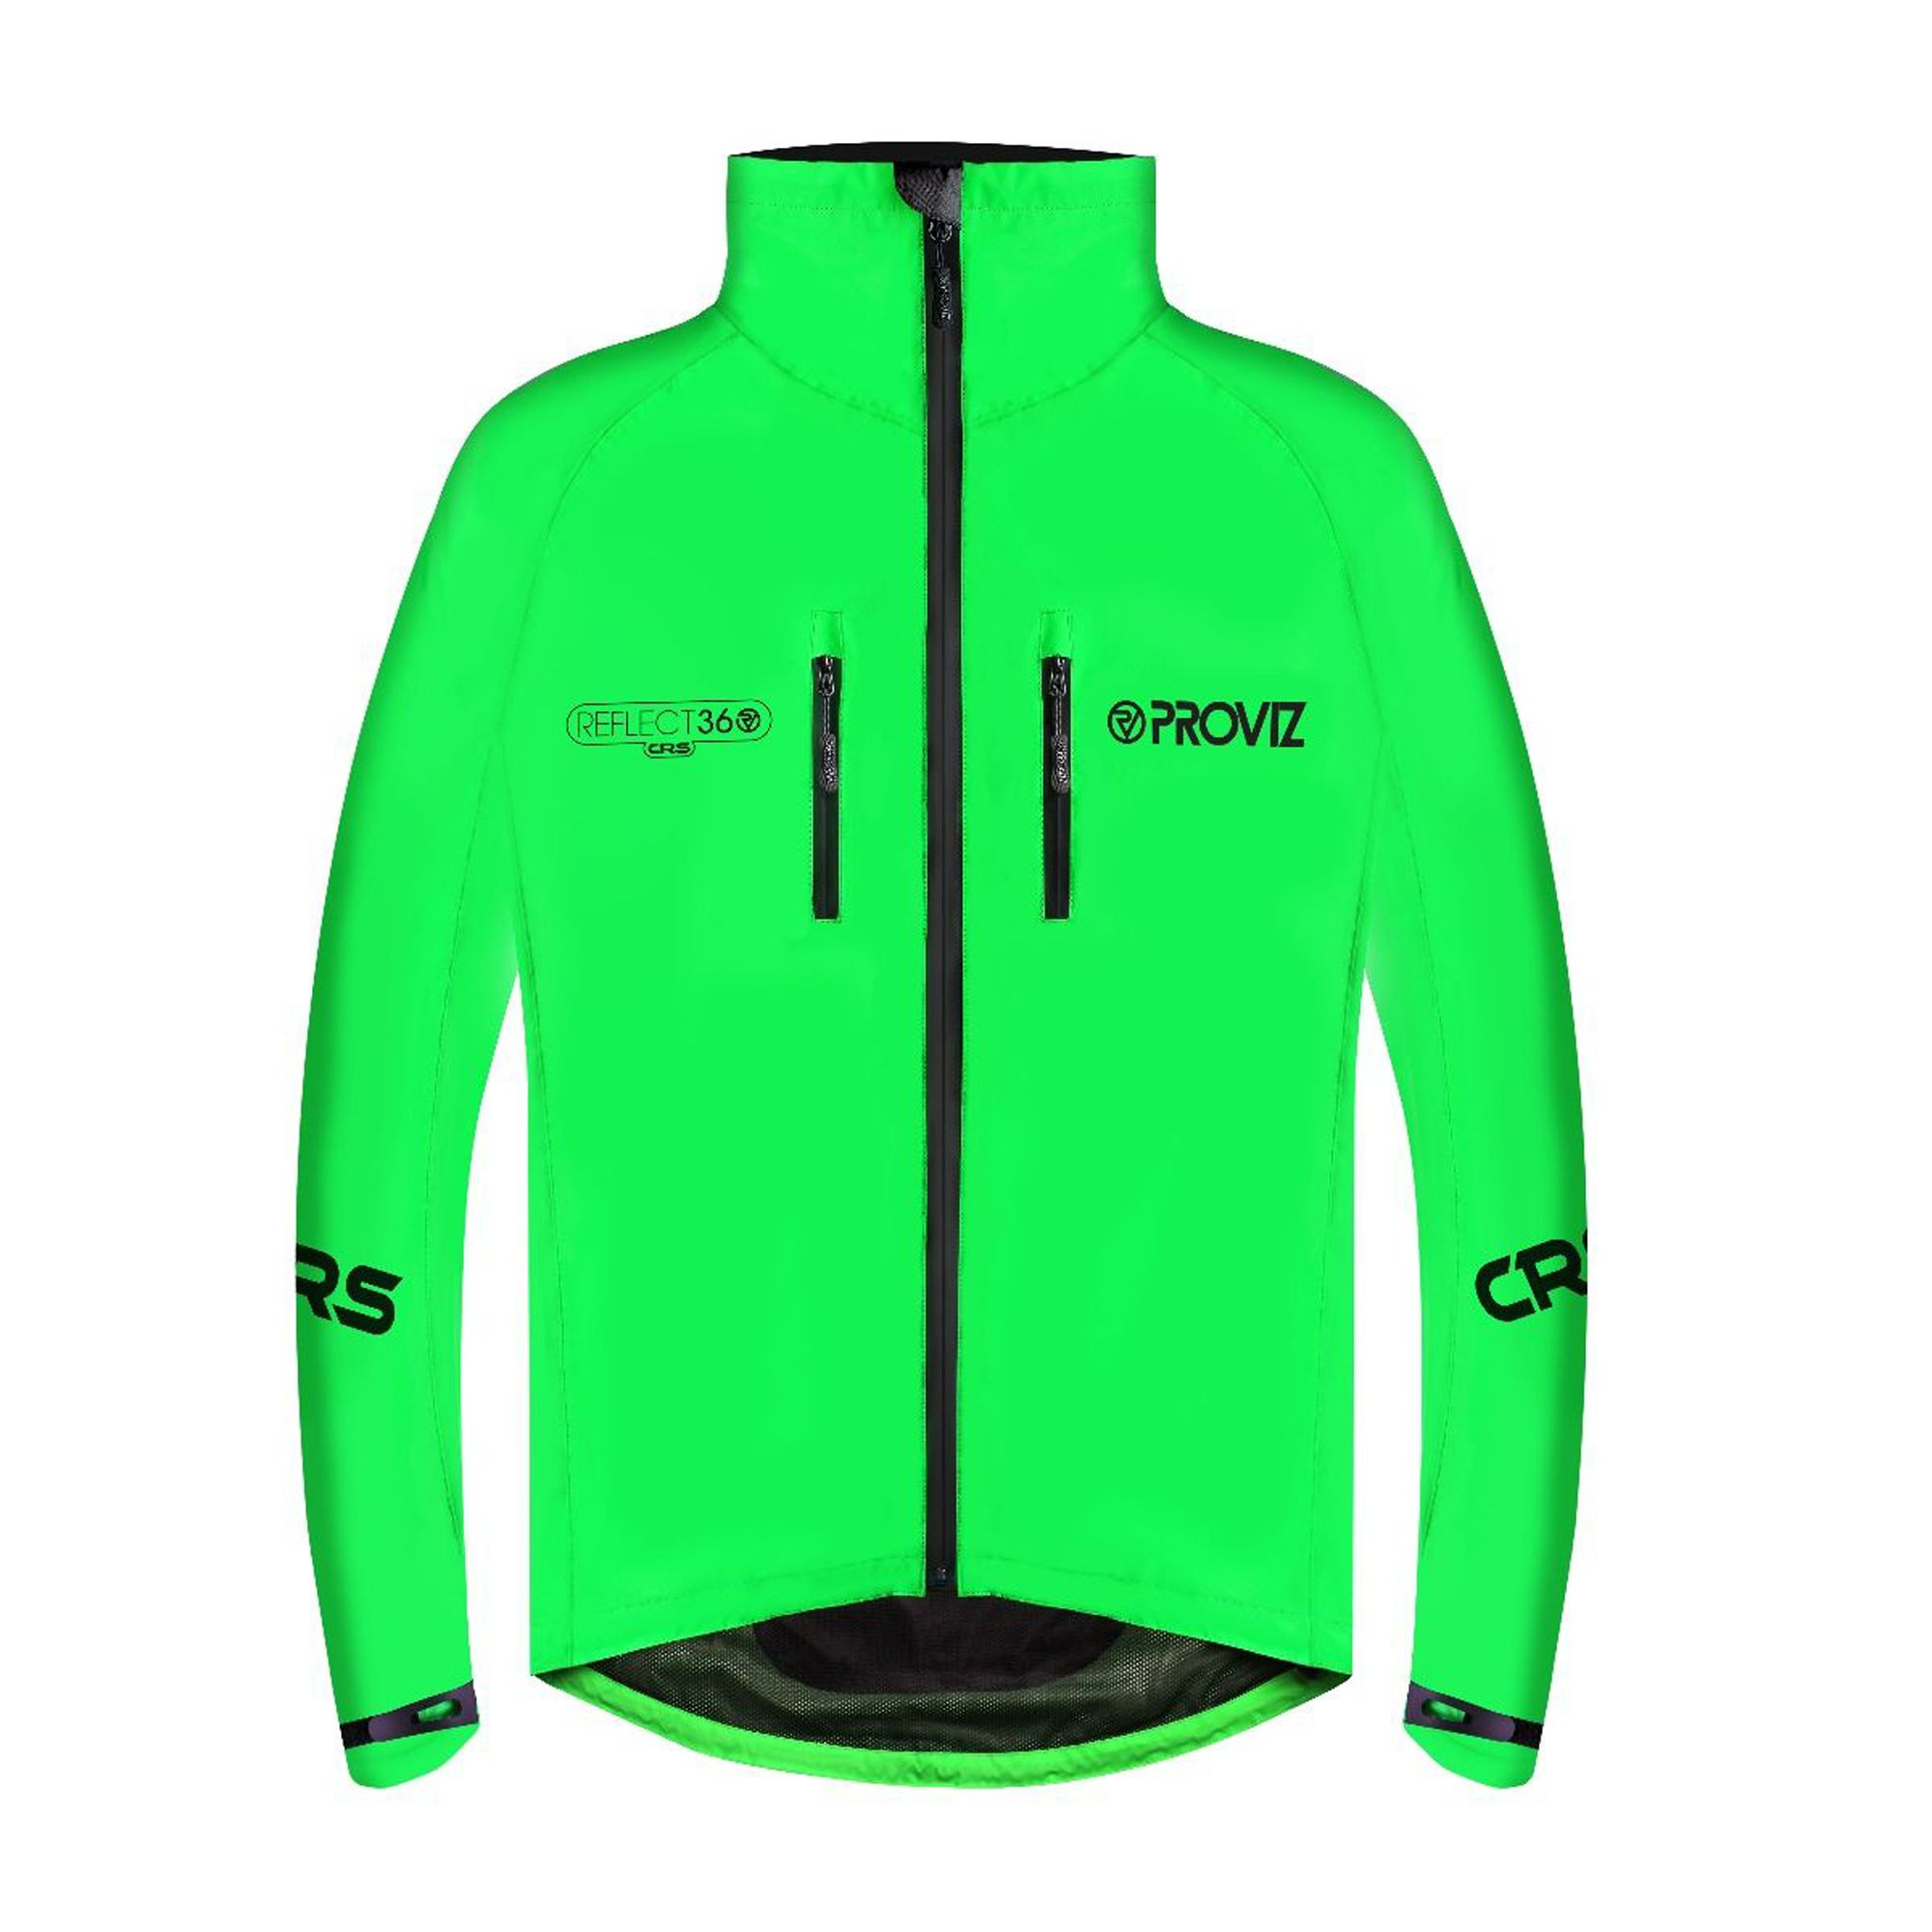 Proviz Reflect 360 Mens Water-Resistant Windproof Cycling Jacket